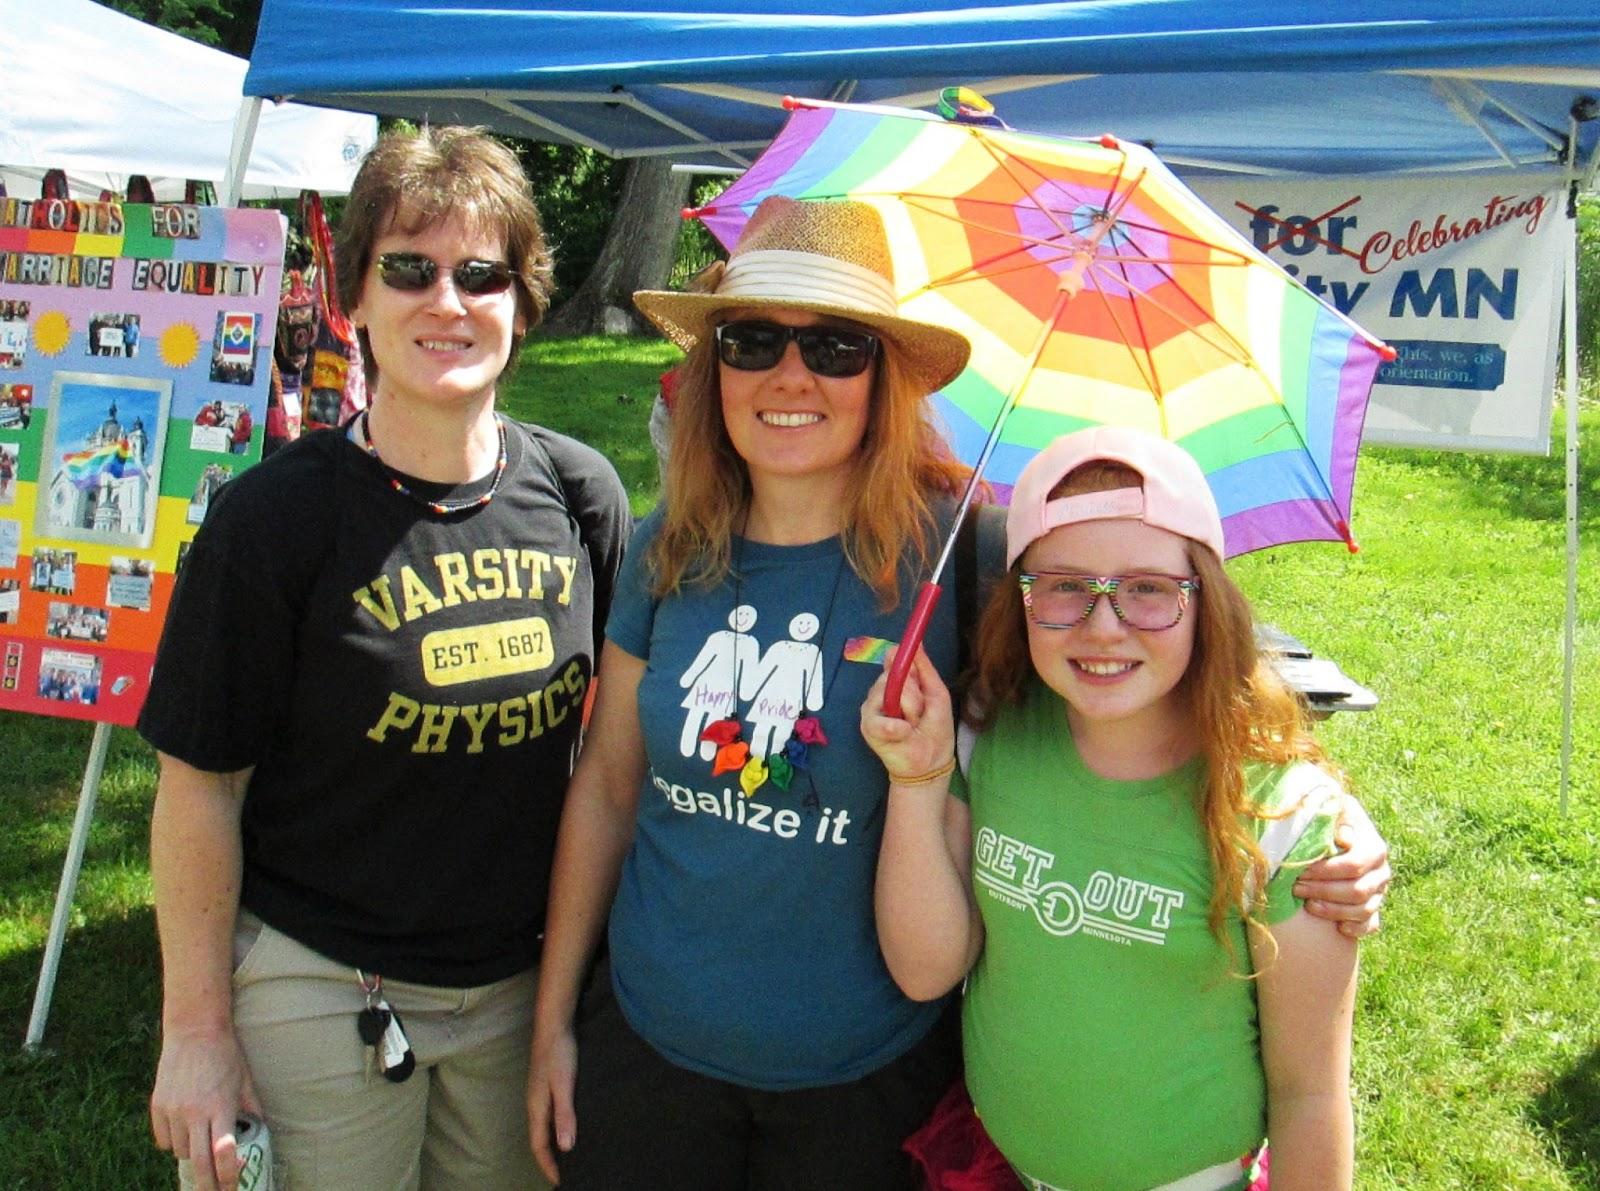 Sensus Fidelium Celebrating Marriage Equality At Pride